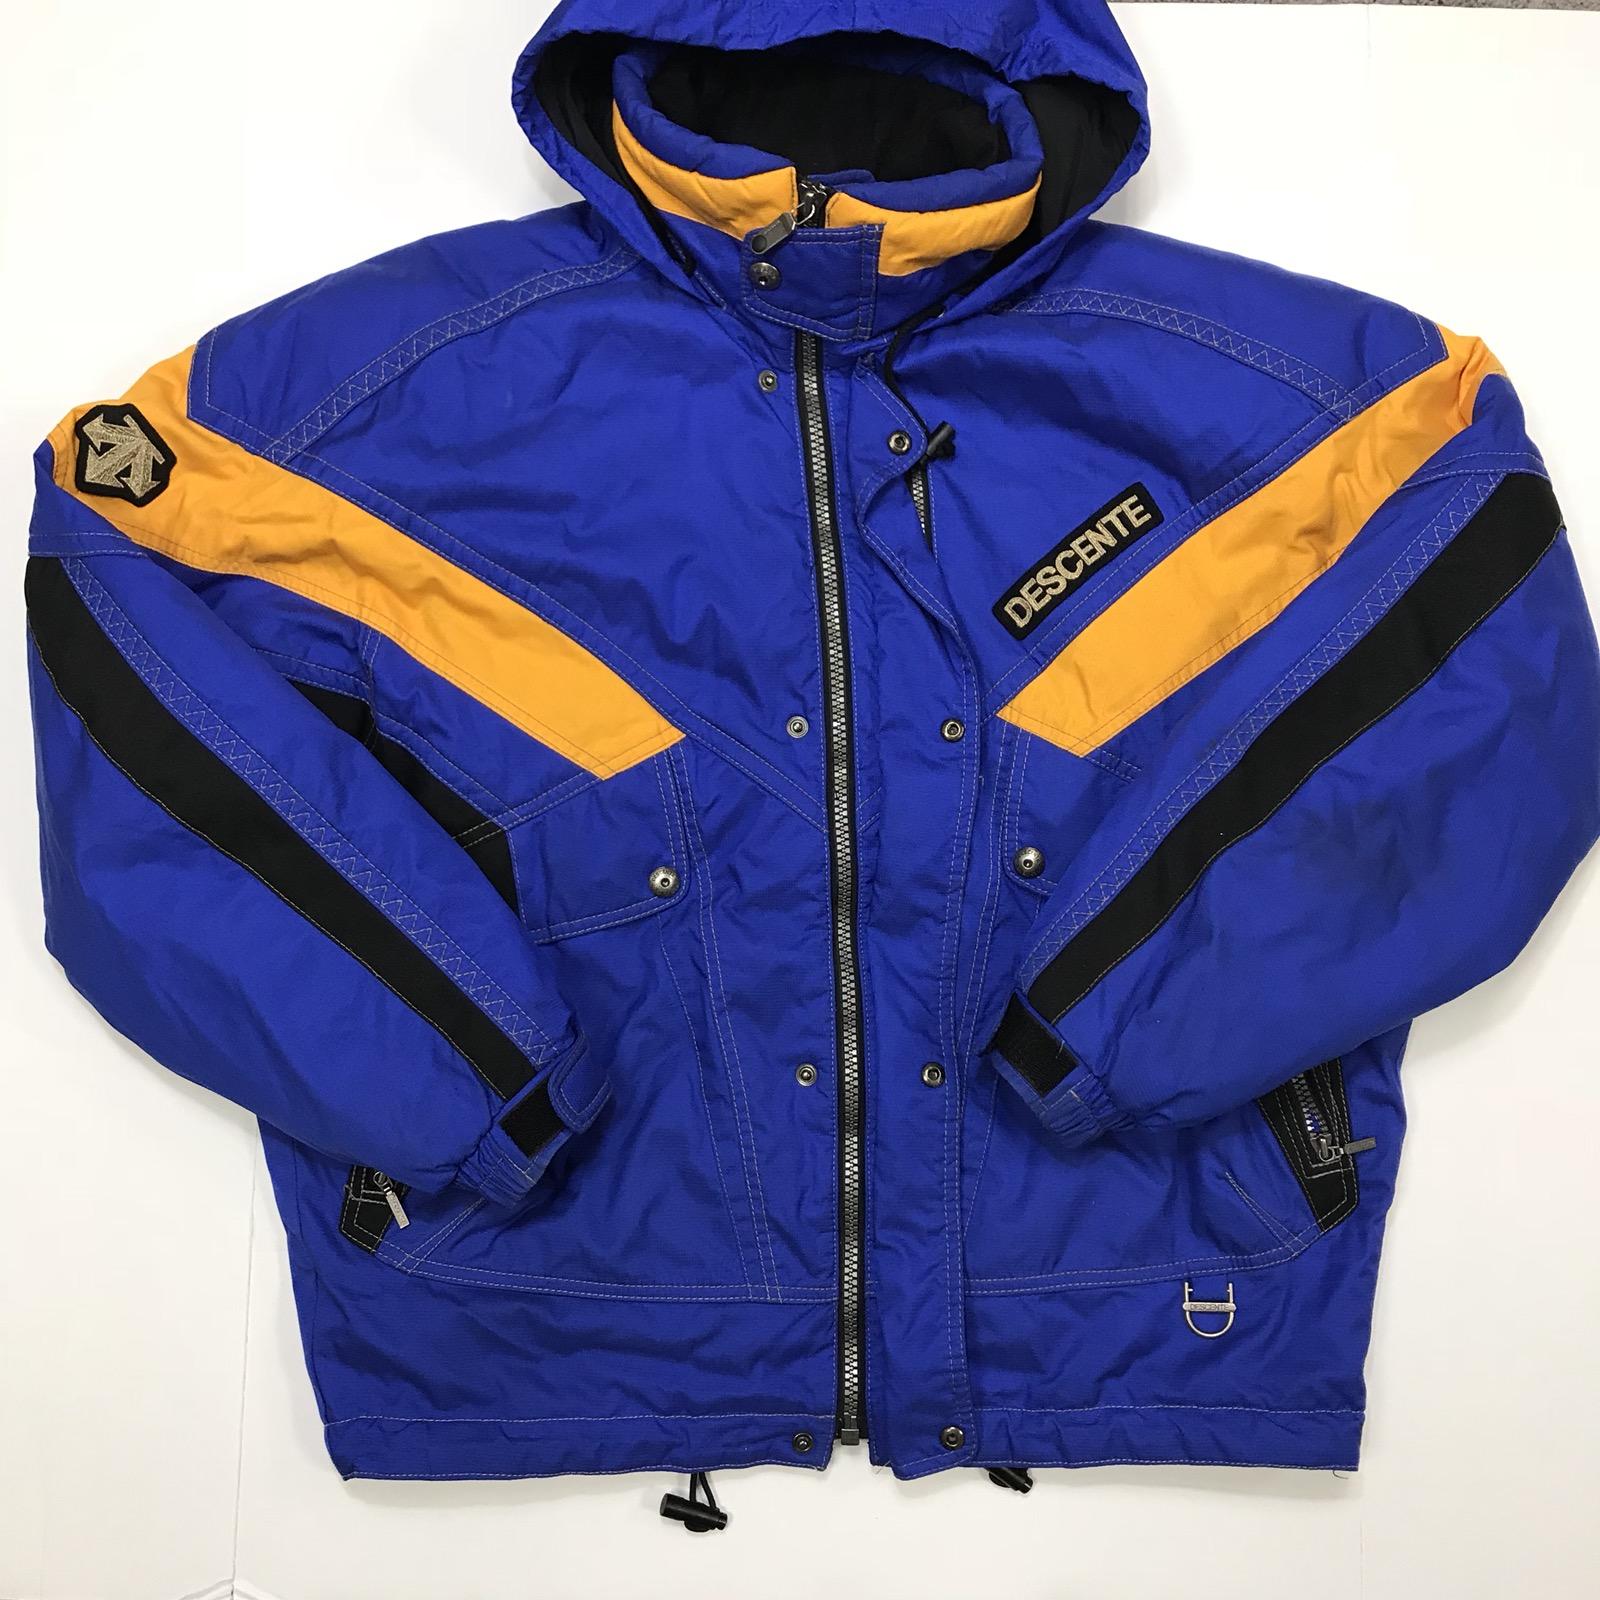 Vintage 80/'s 90/'s DESCENTE Retro Oversized Colourblock Blue Turquoise Winter Ski  Jacket Snowboarding Puffer size L  52 men